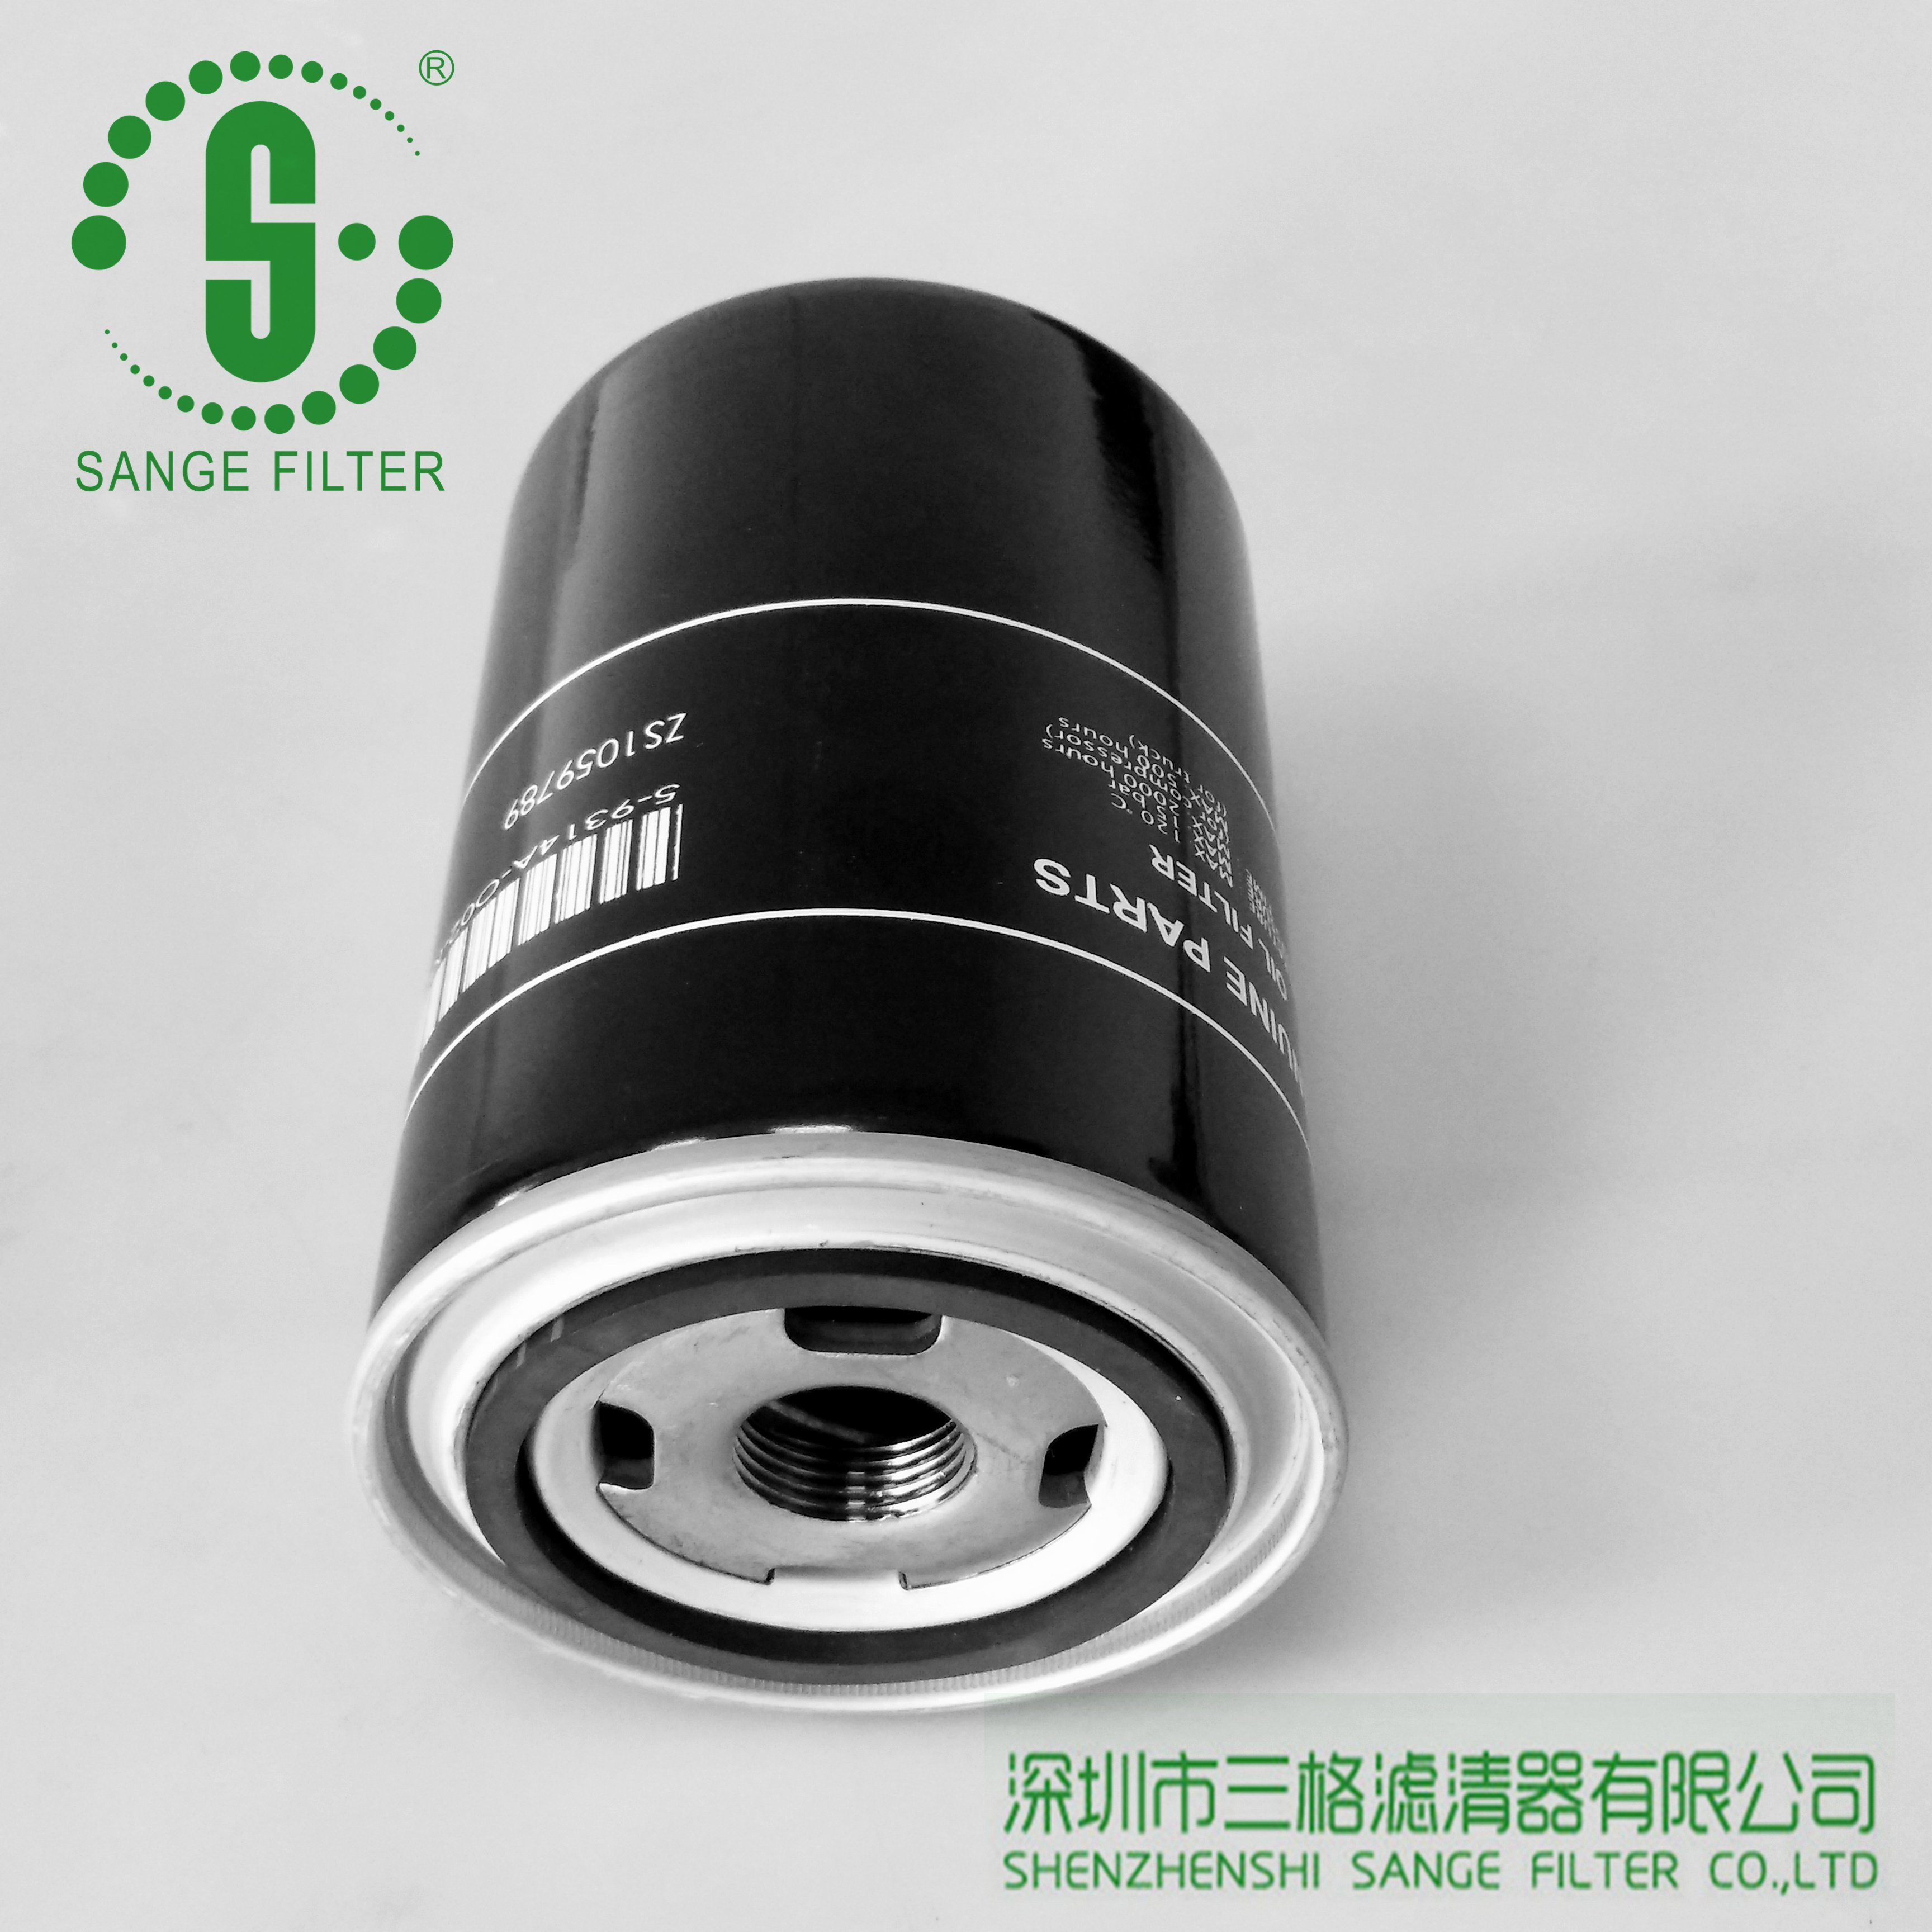 ZS1059789 Oil Filter for Gardiner Denver Air Compressors Replacement Oil Filter Element